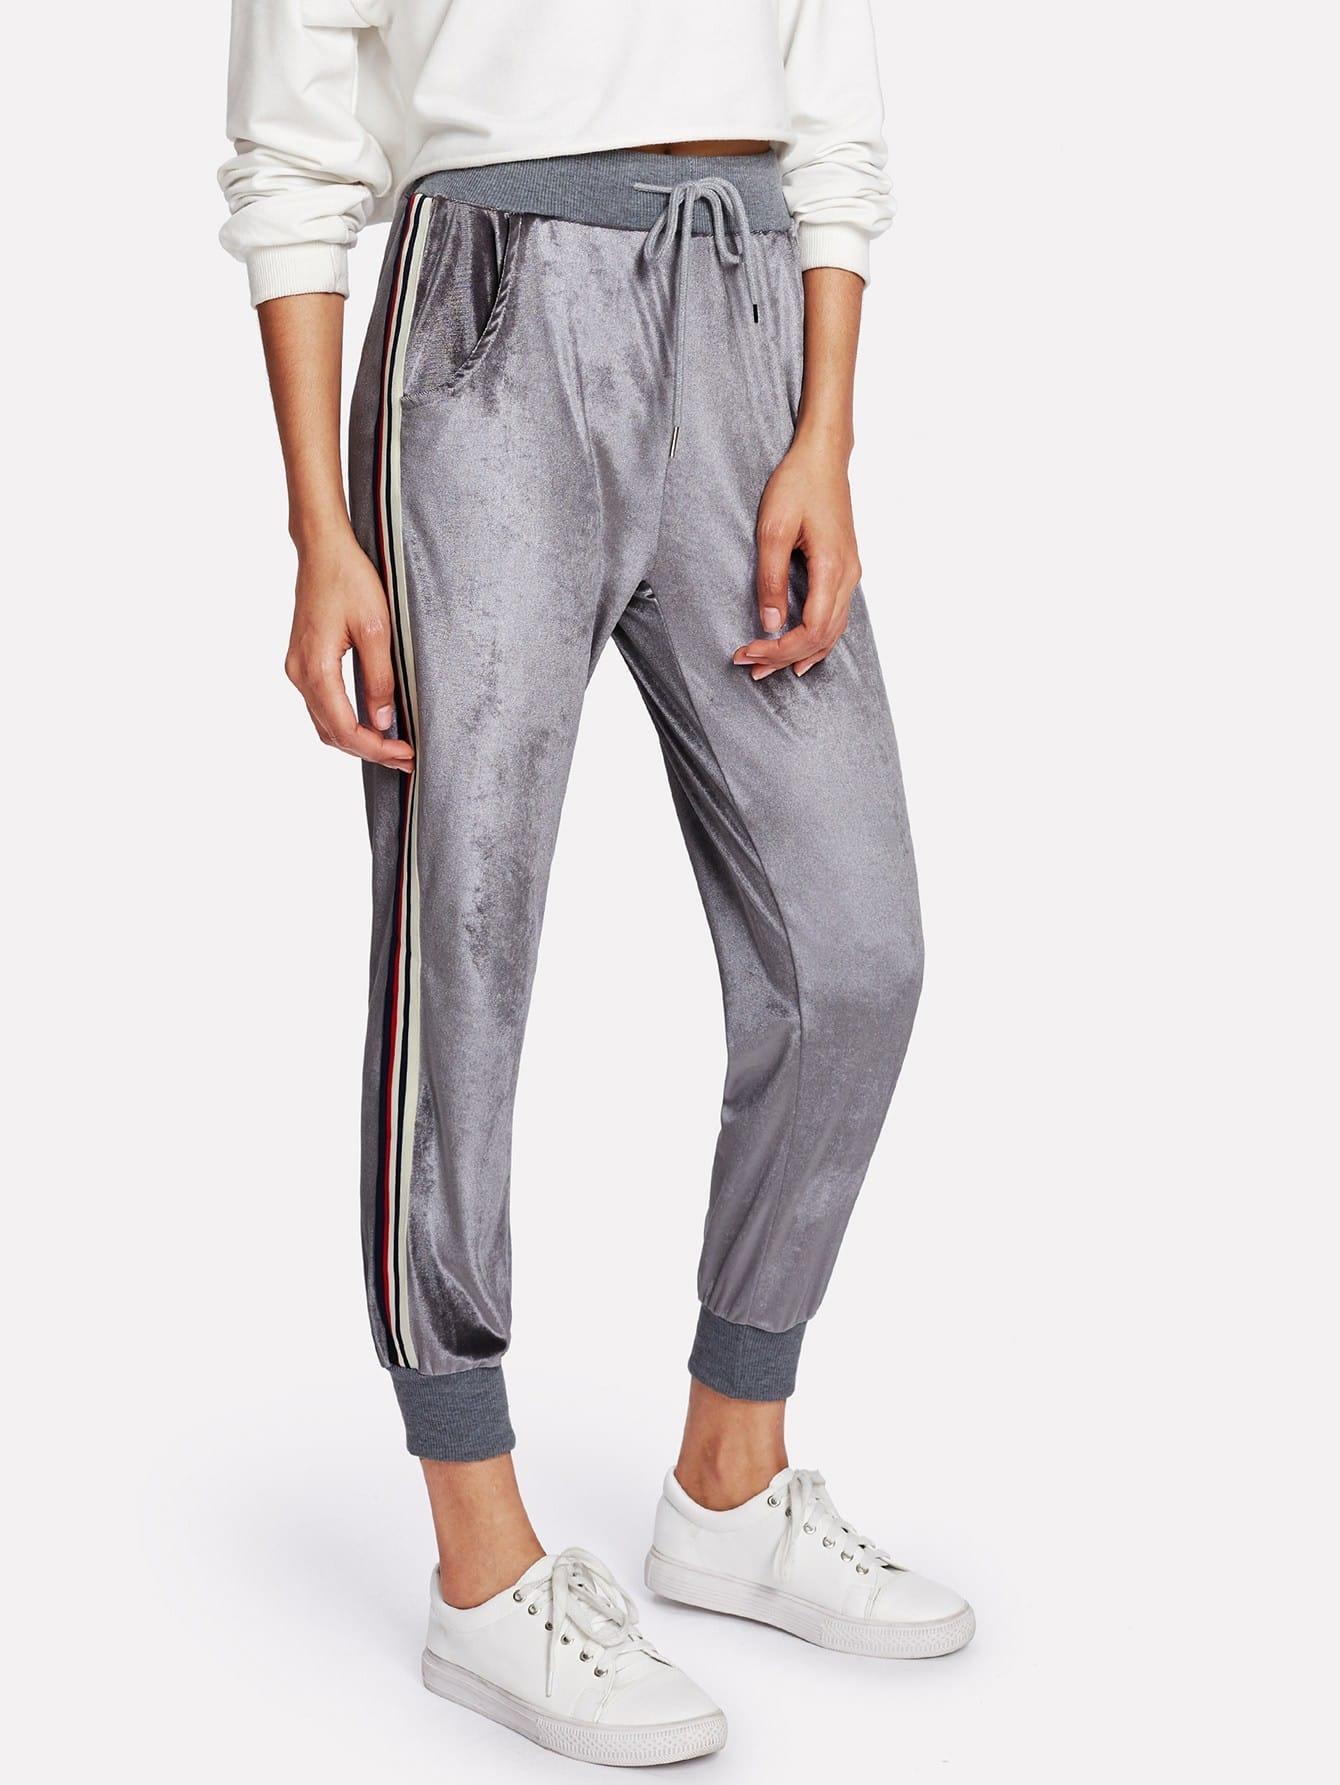 Striped Tape Side Velvet Pants striped tape side cuffed pants